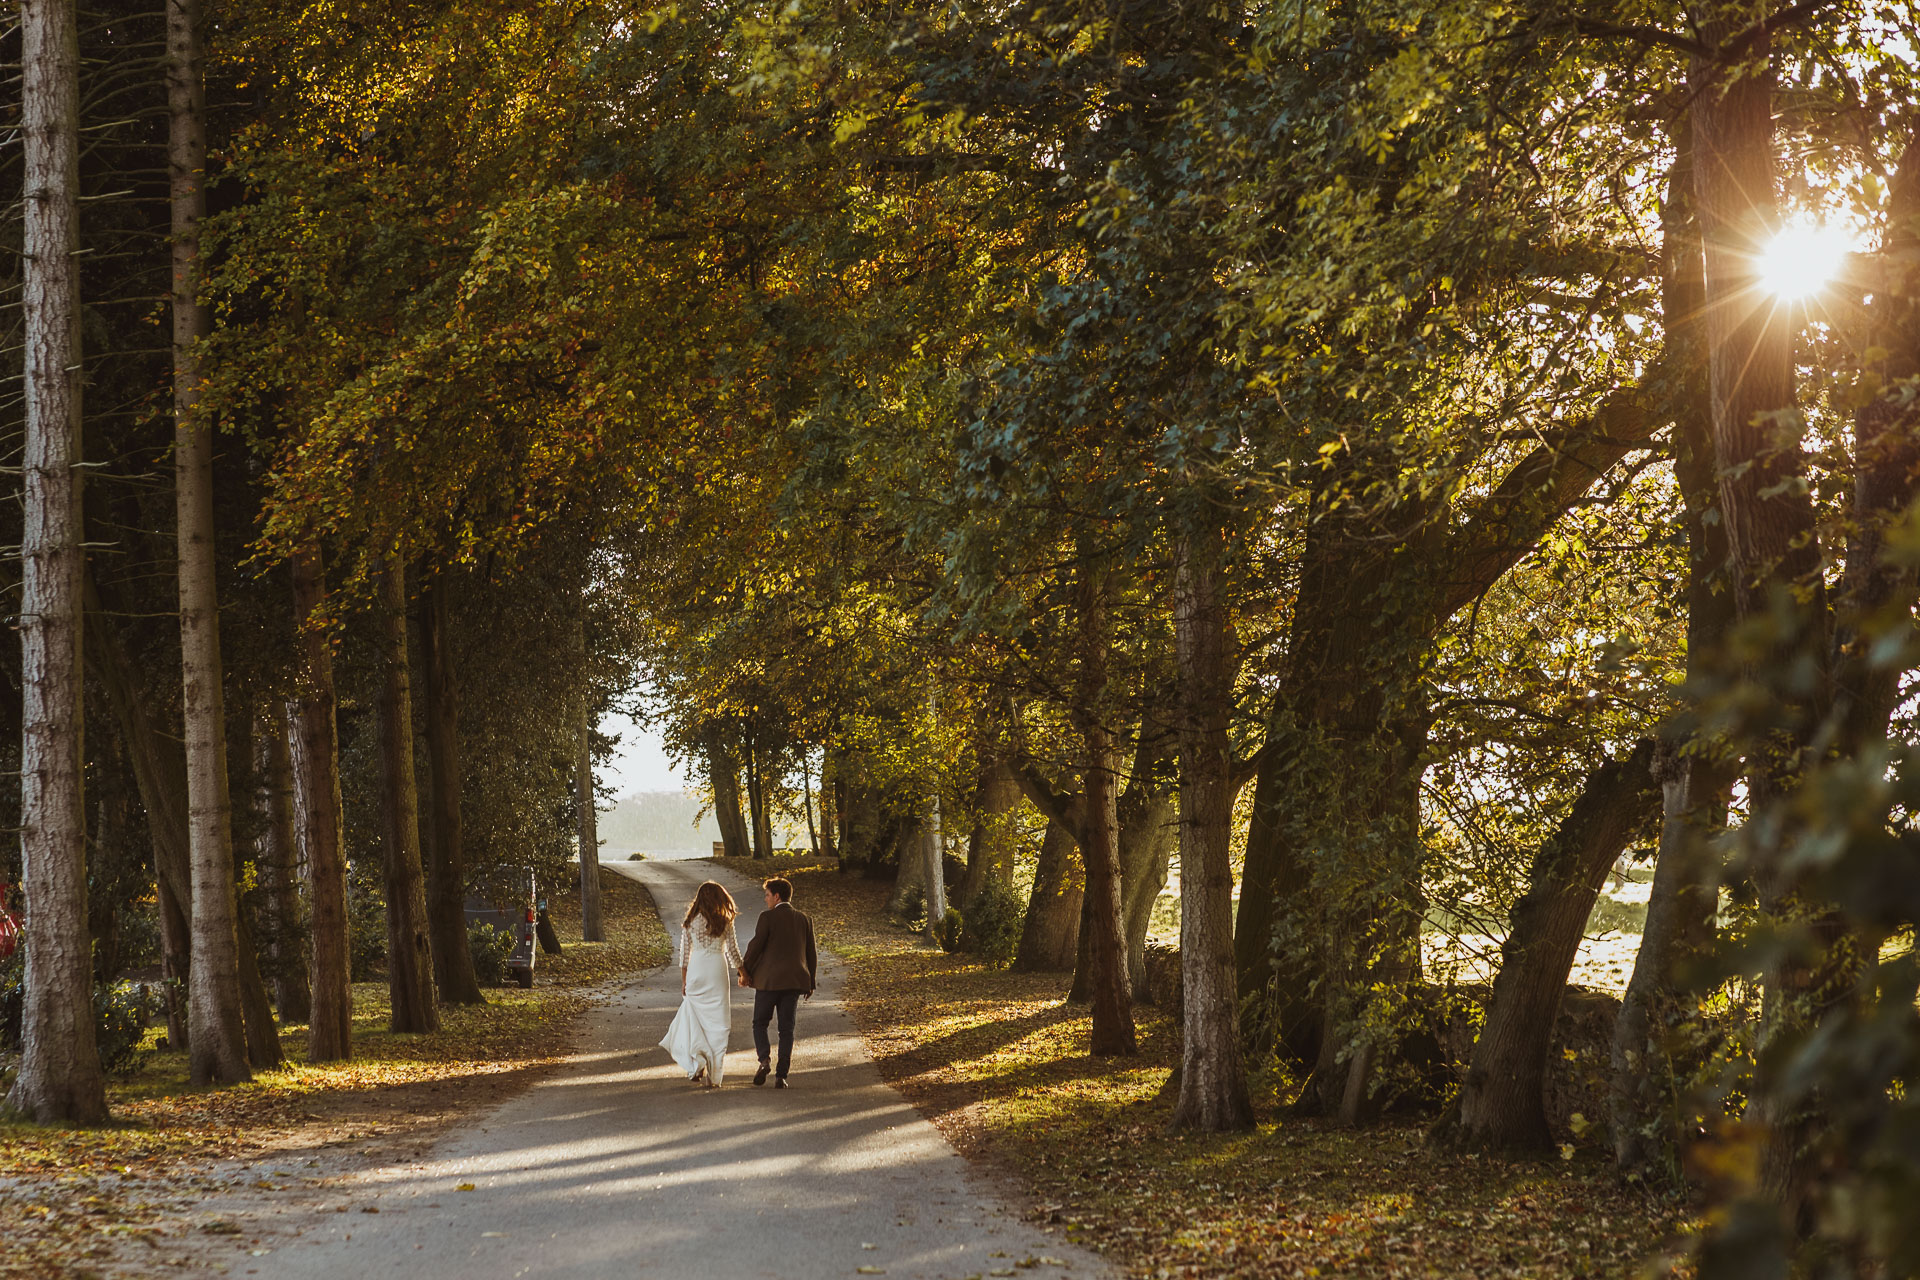 middleton_lodge_wedding_photographer-103.jpg